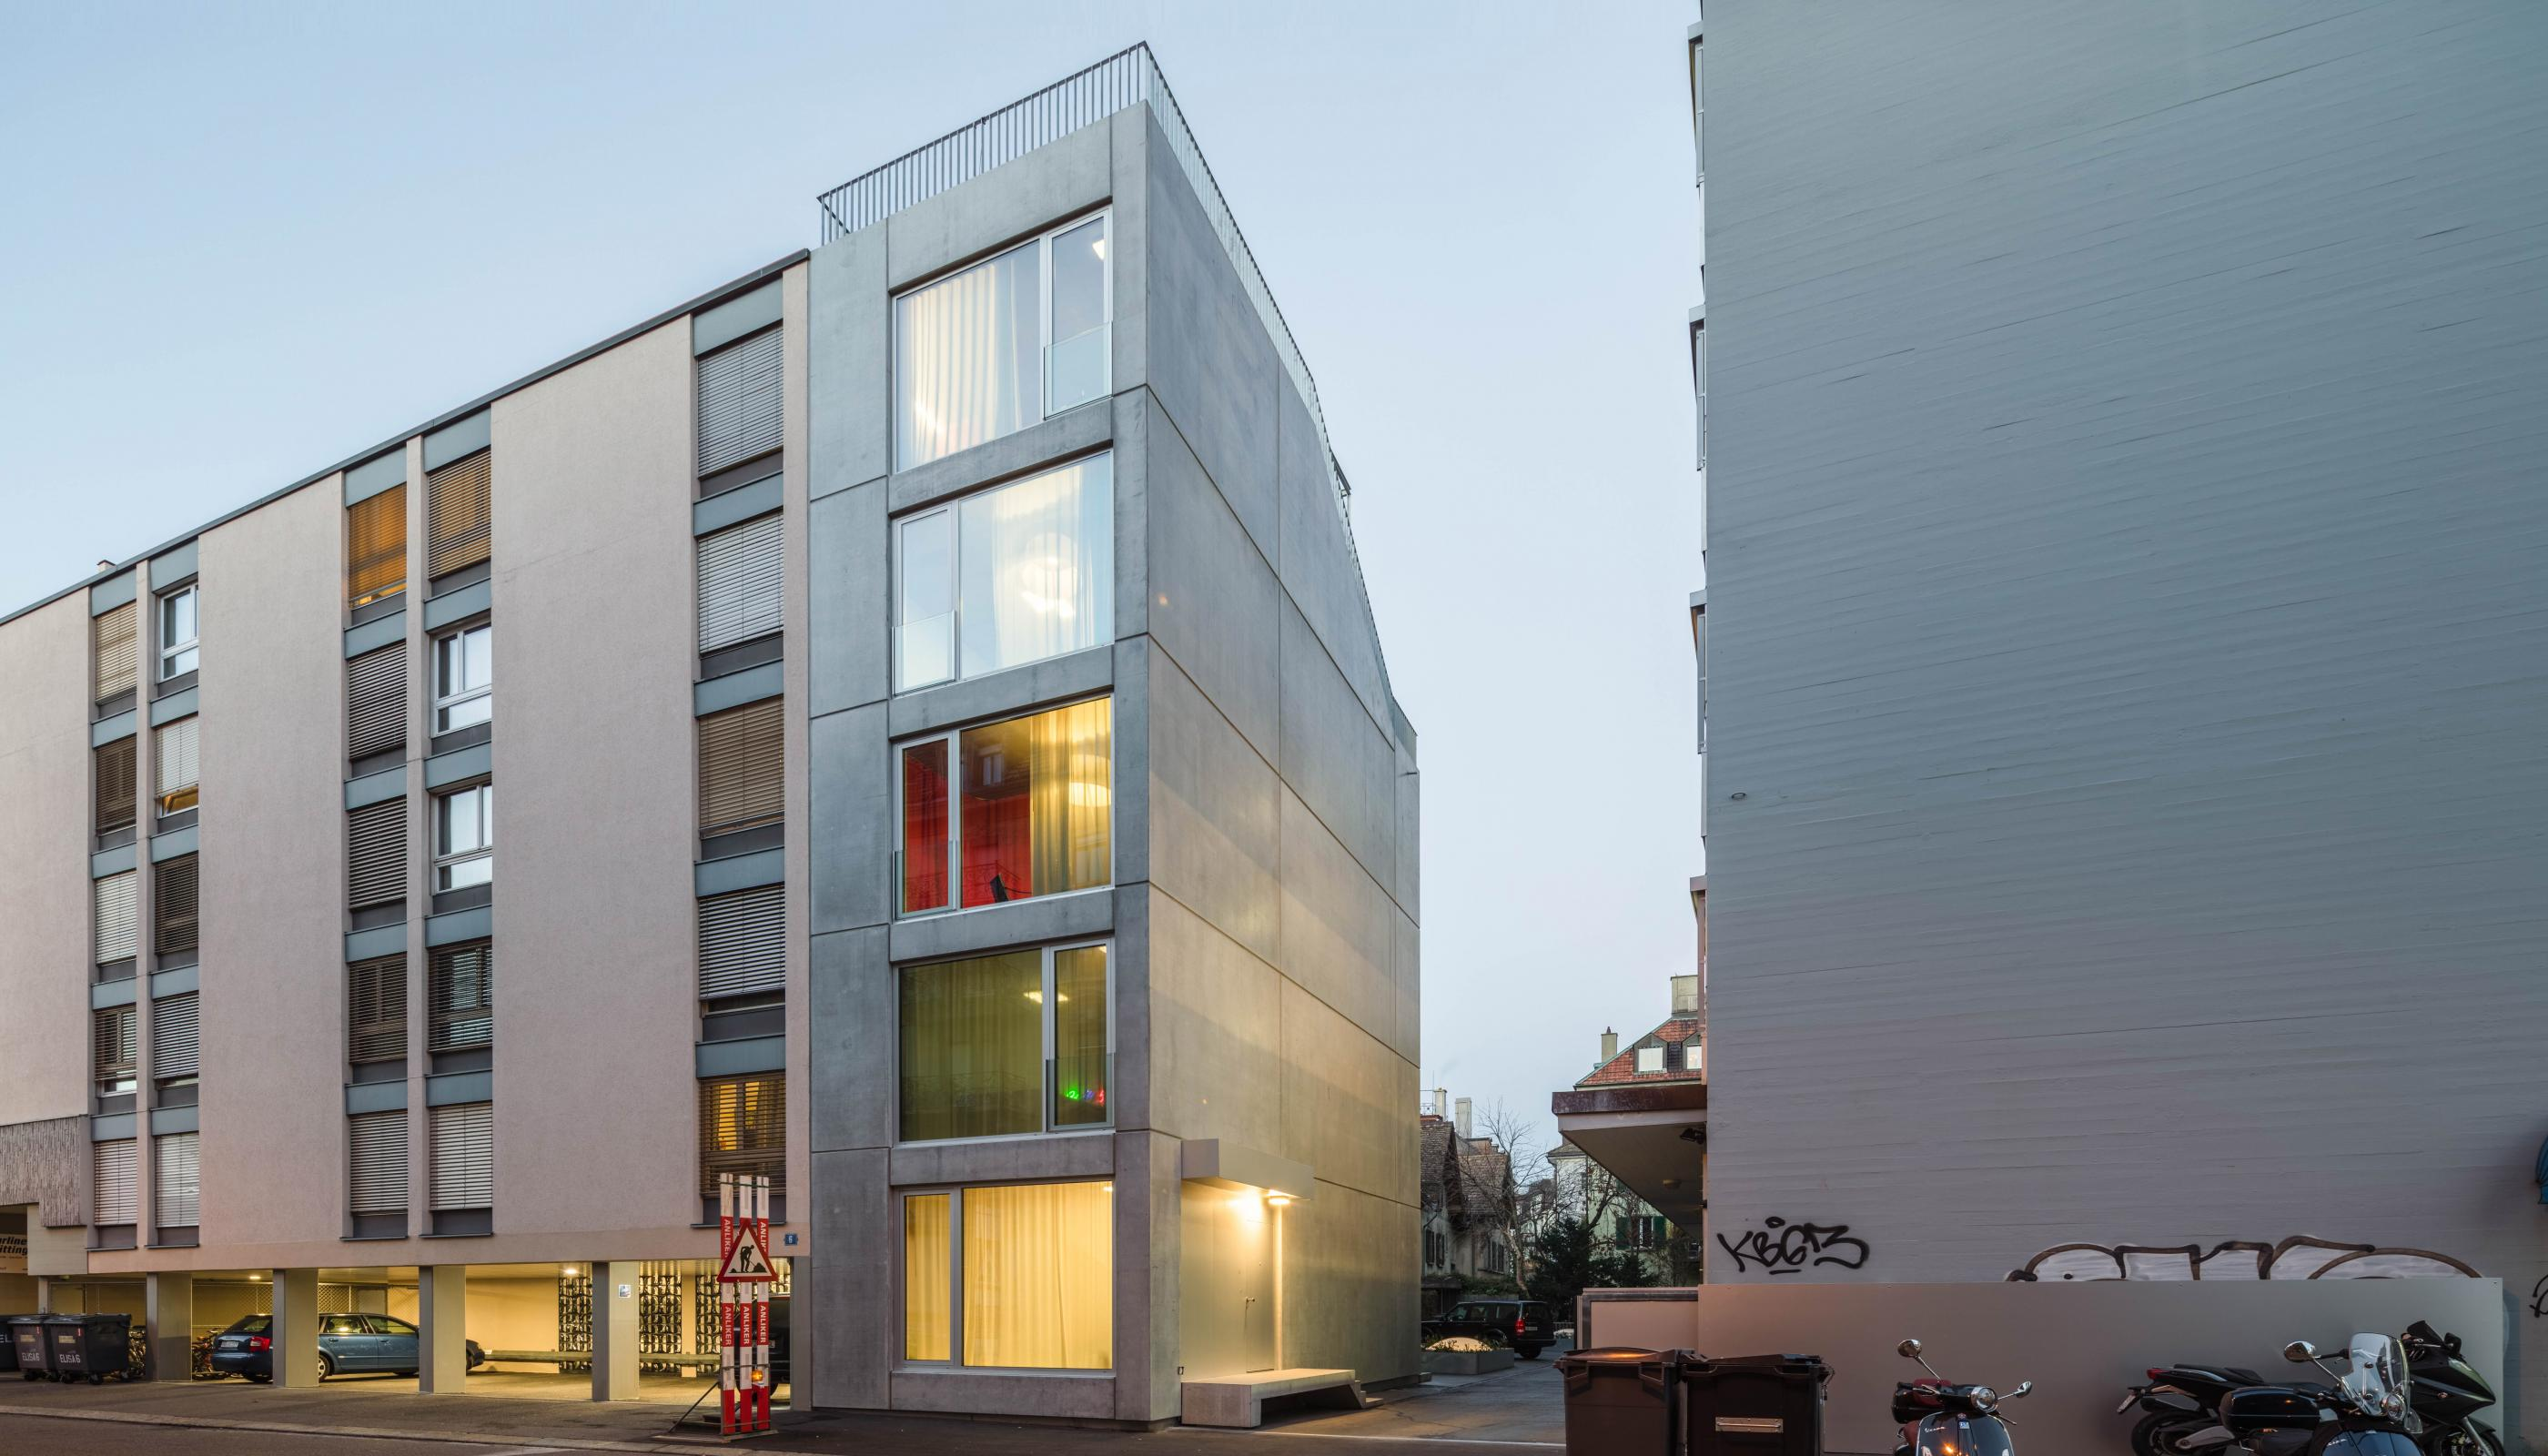 Projekte holzer kobler architekturen